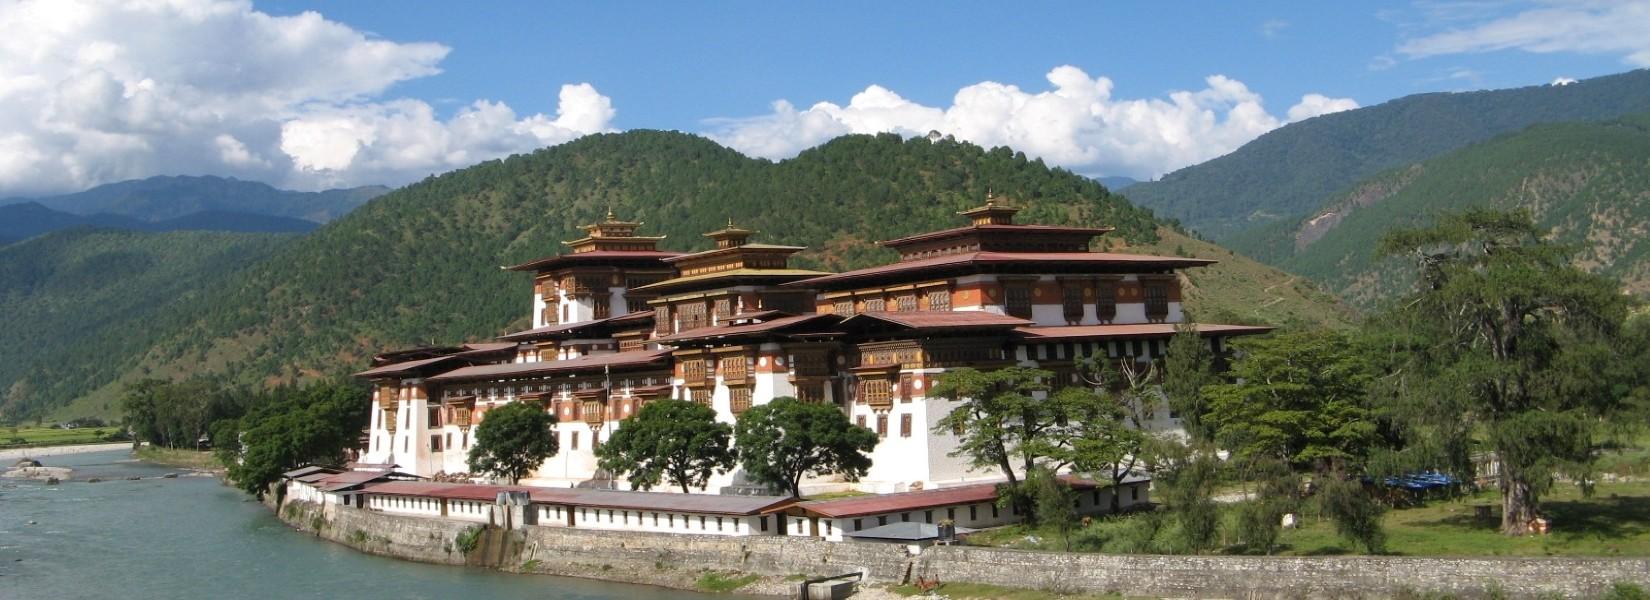 Discover Bhutan Cultural Tour